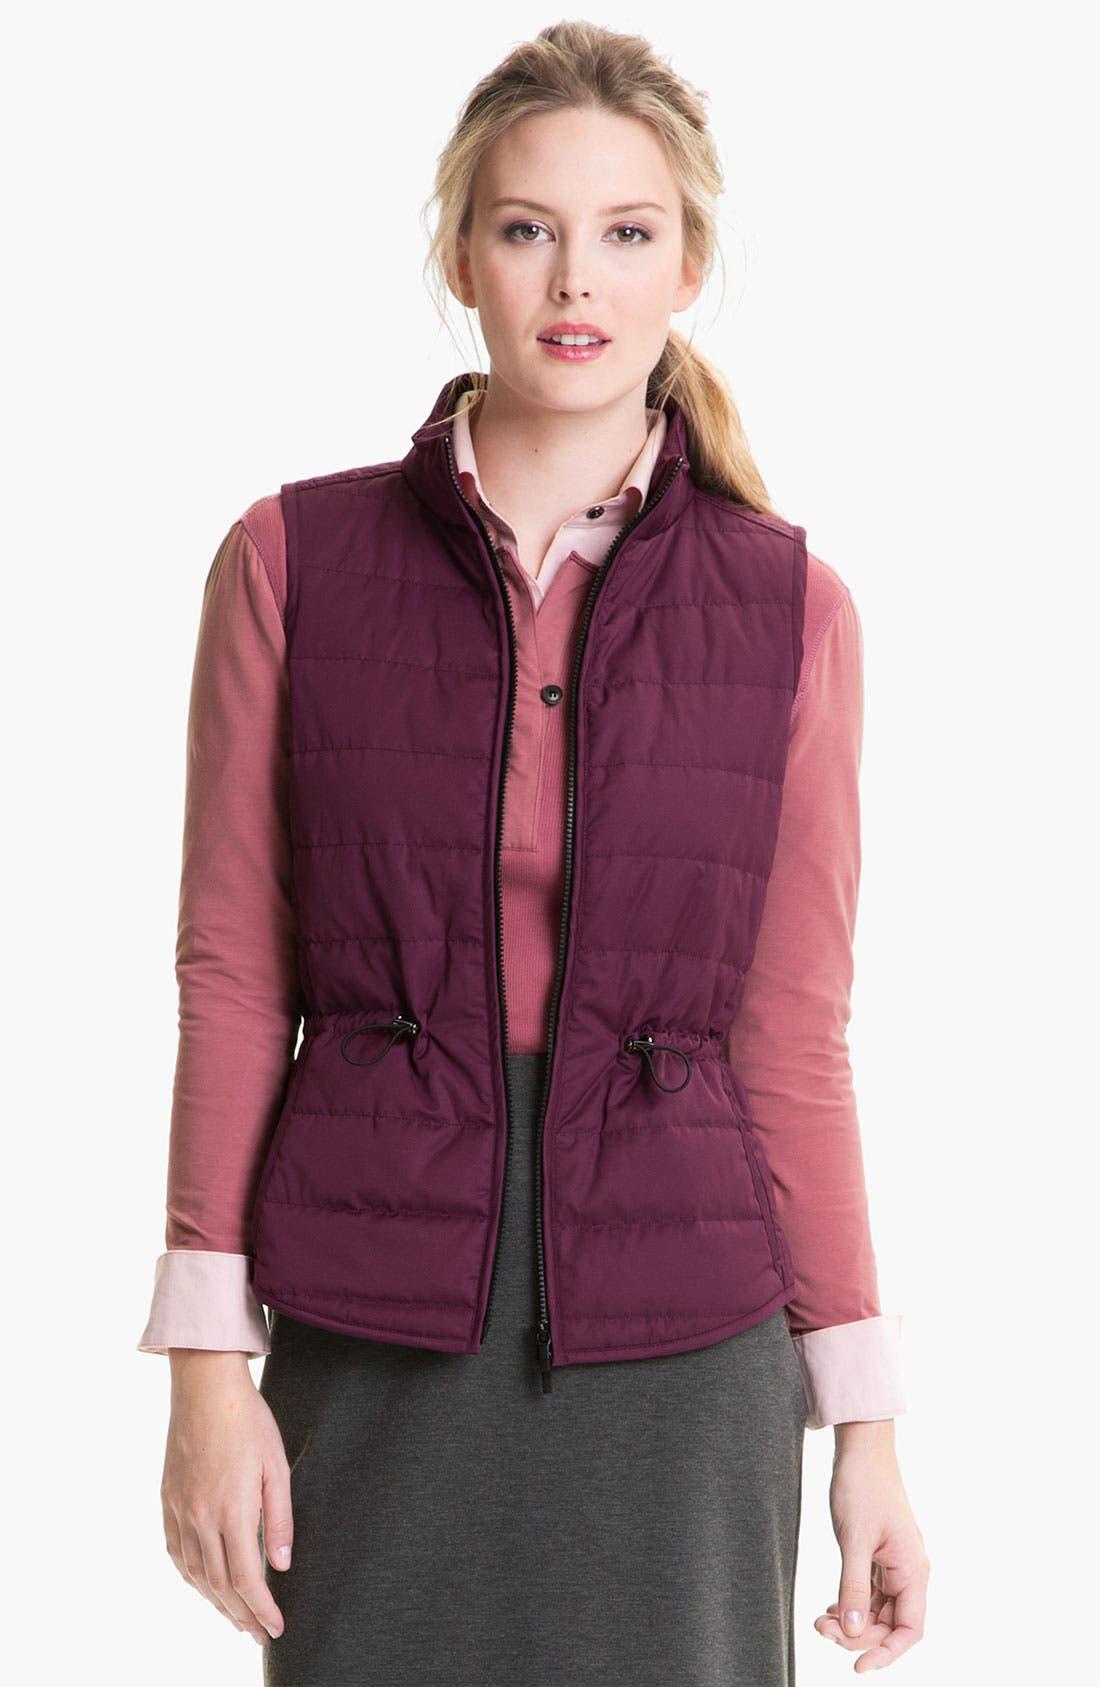 Alternate Image 1 Selected - Lafayette 148 New York 'Dynamic' Vest